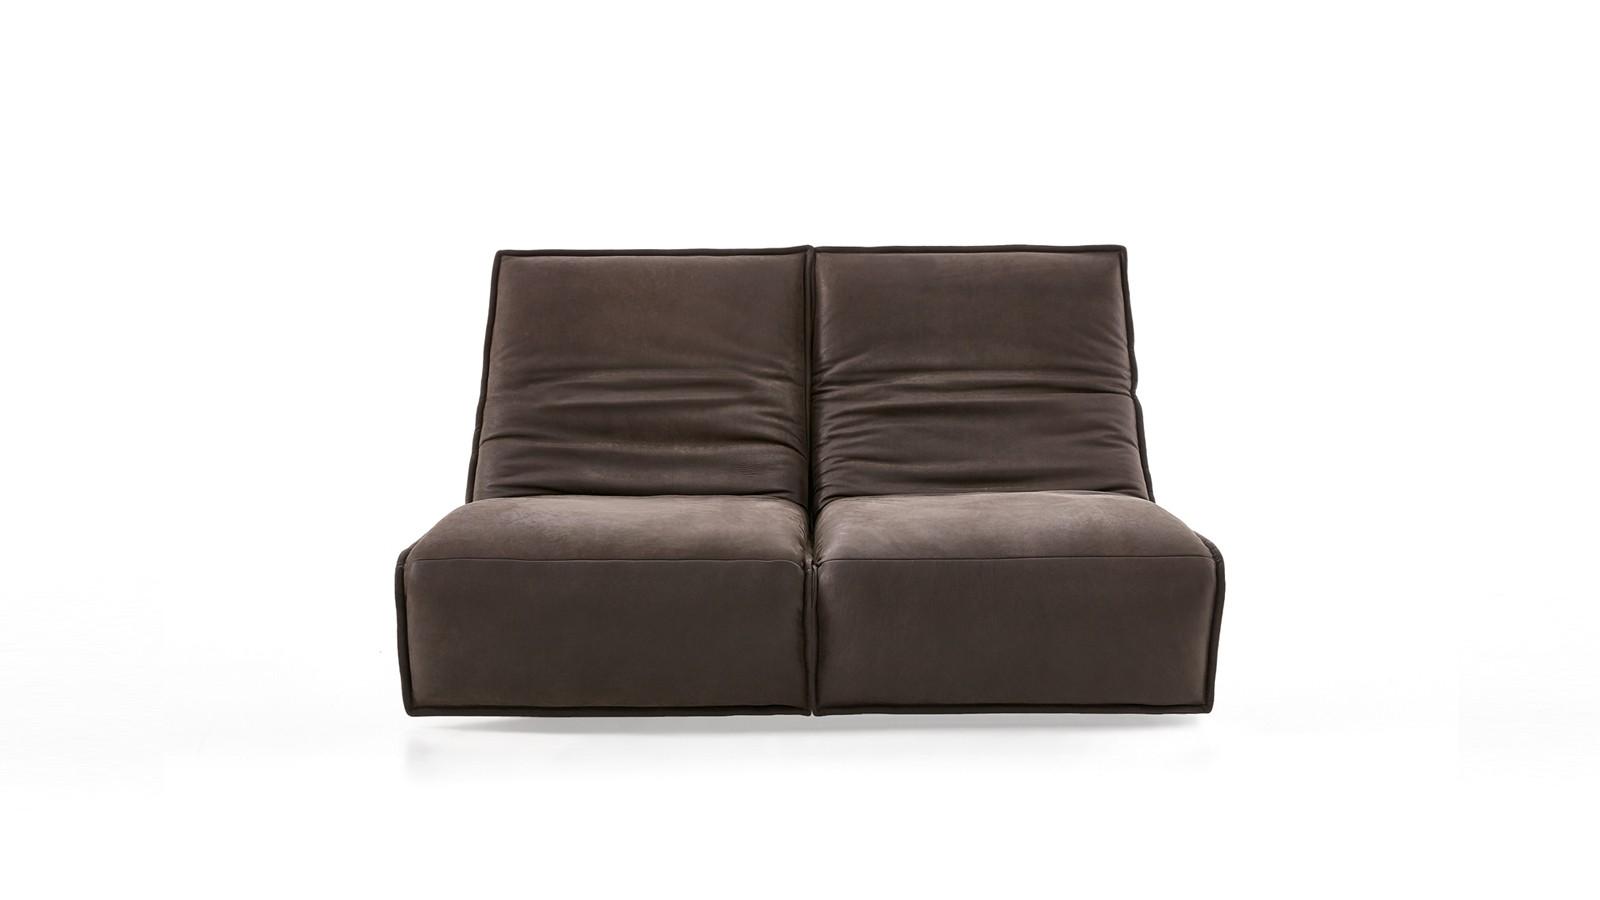 Canapea modernă Koinor Epiq - Free motion